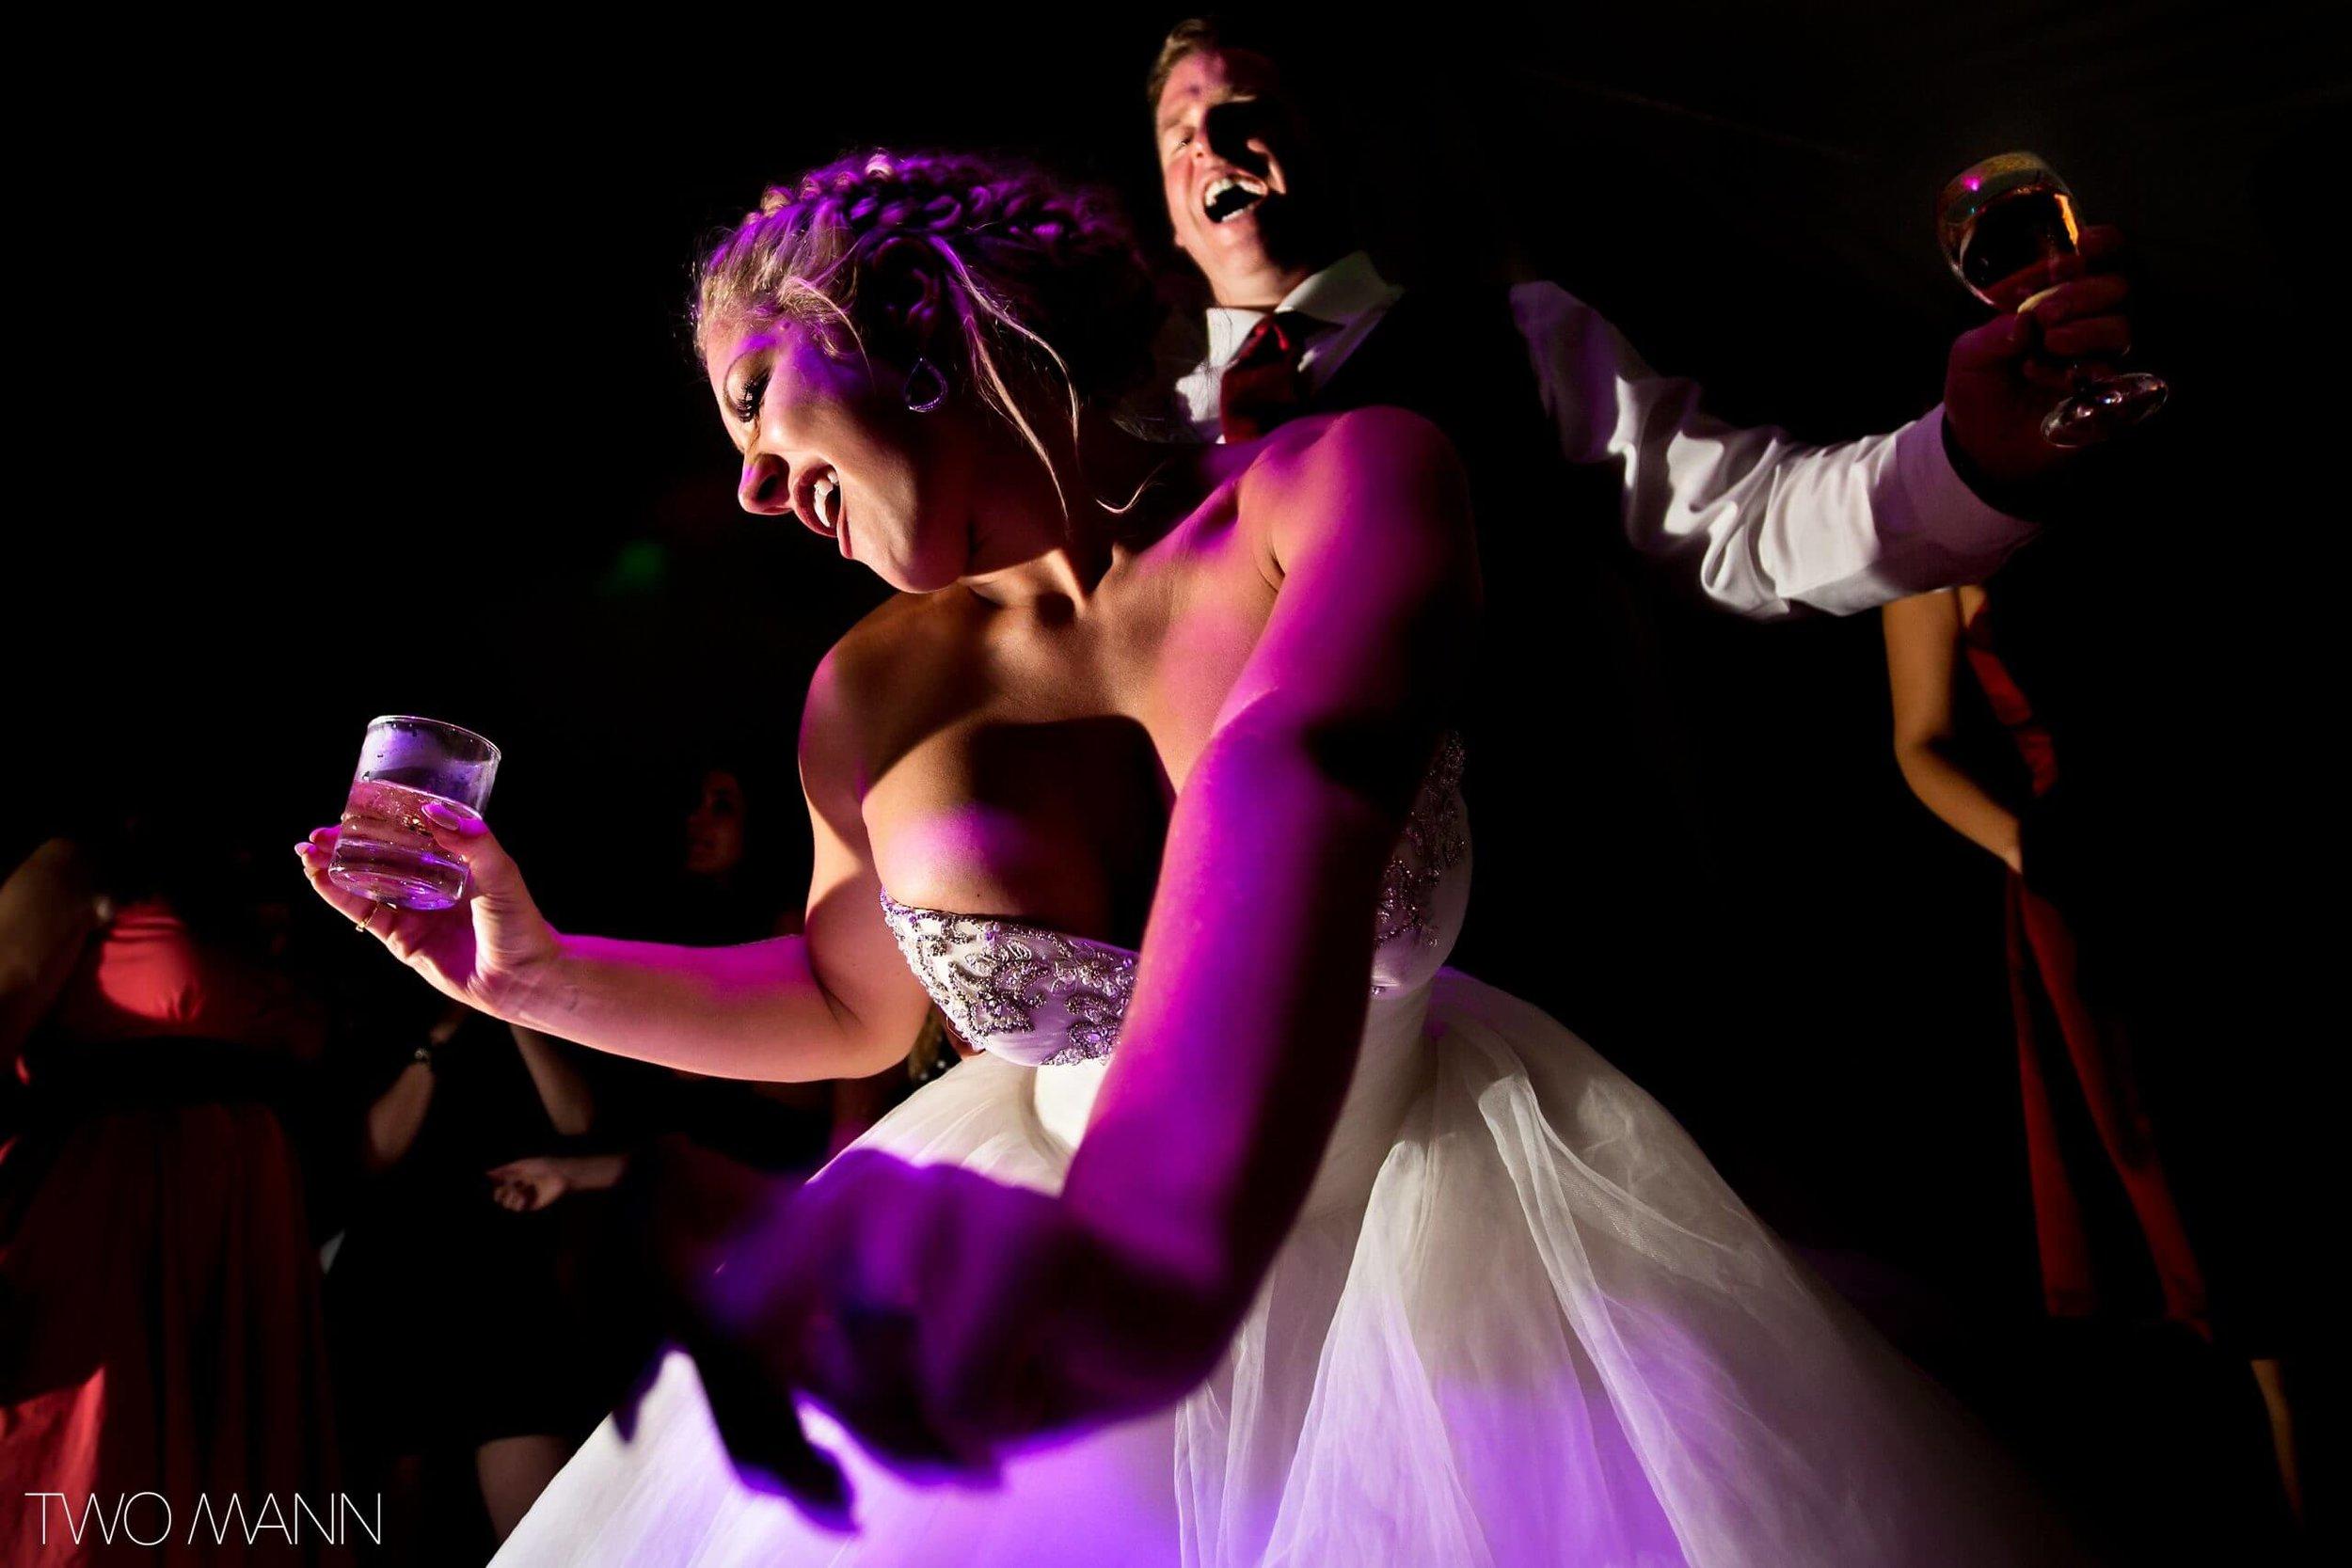 Two-Mann-Studios-Worlds-Best-Wedding-Photography-Best-of-2016-063-2560x1707.jpg